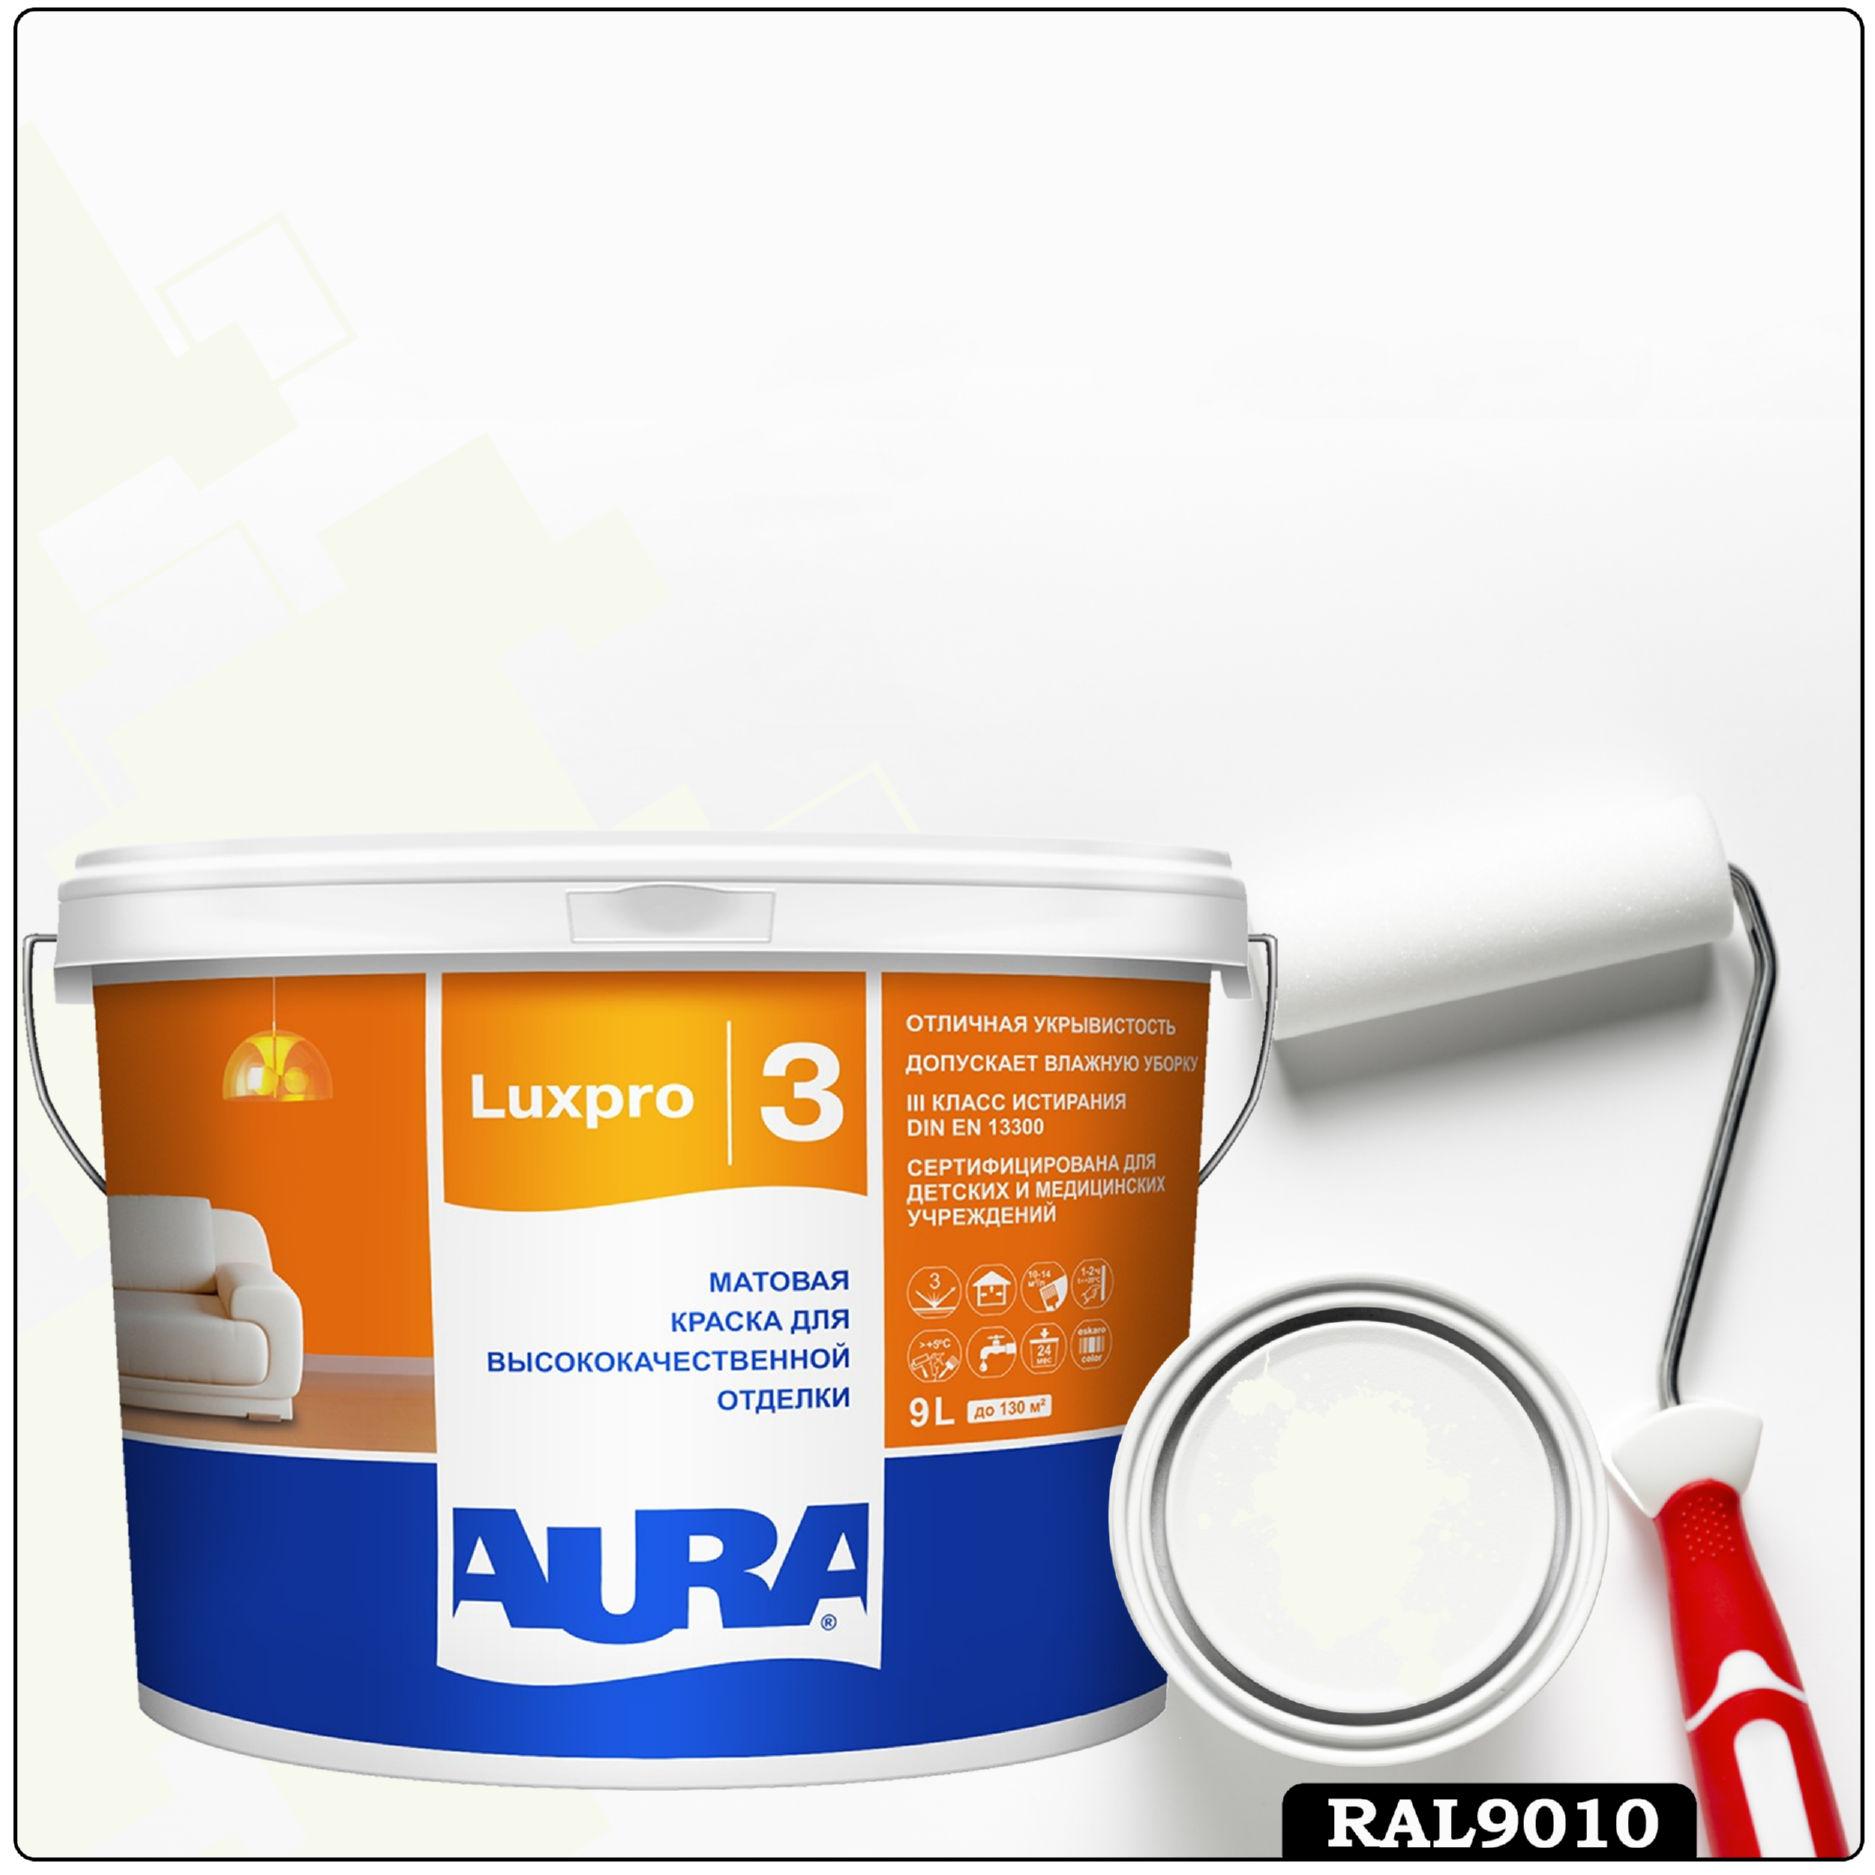 Фото 6 - Краска Aura LuxPRO 3, RAL 9010 Белый, латексная, шелково-матовая, интерьерная, 9л, Аура.